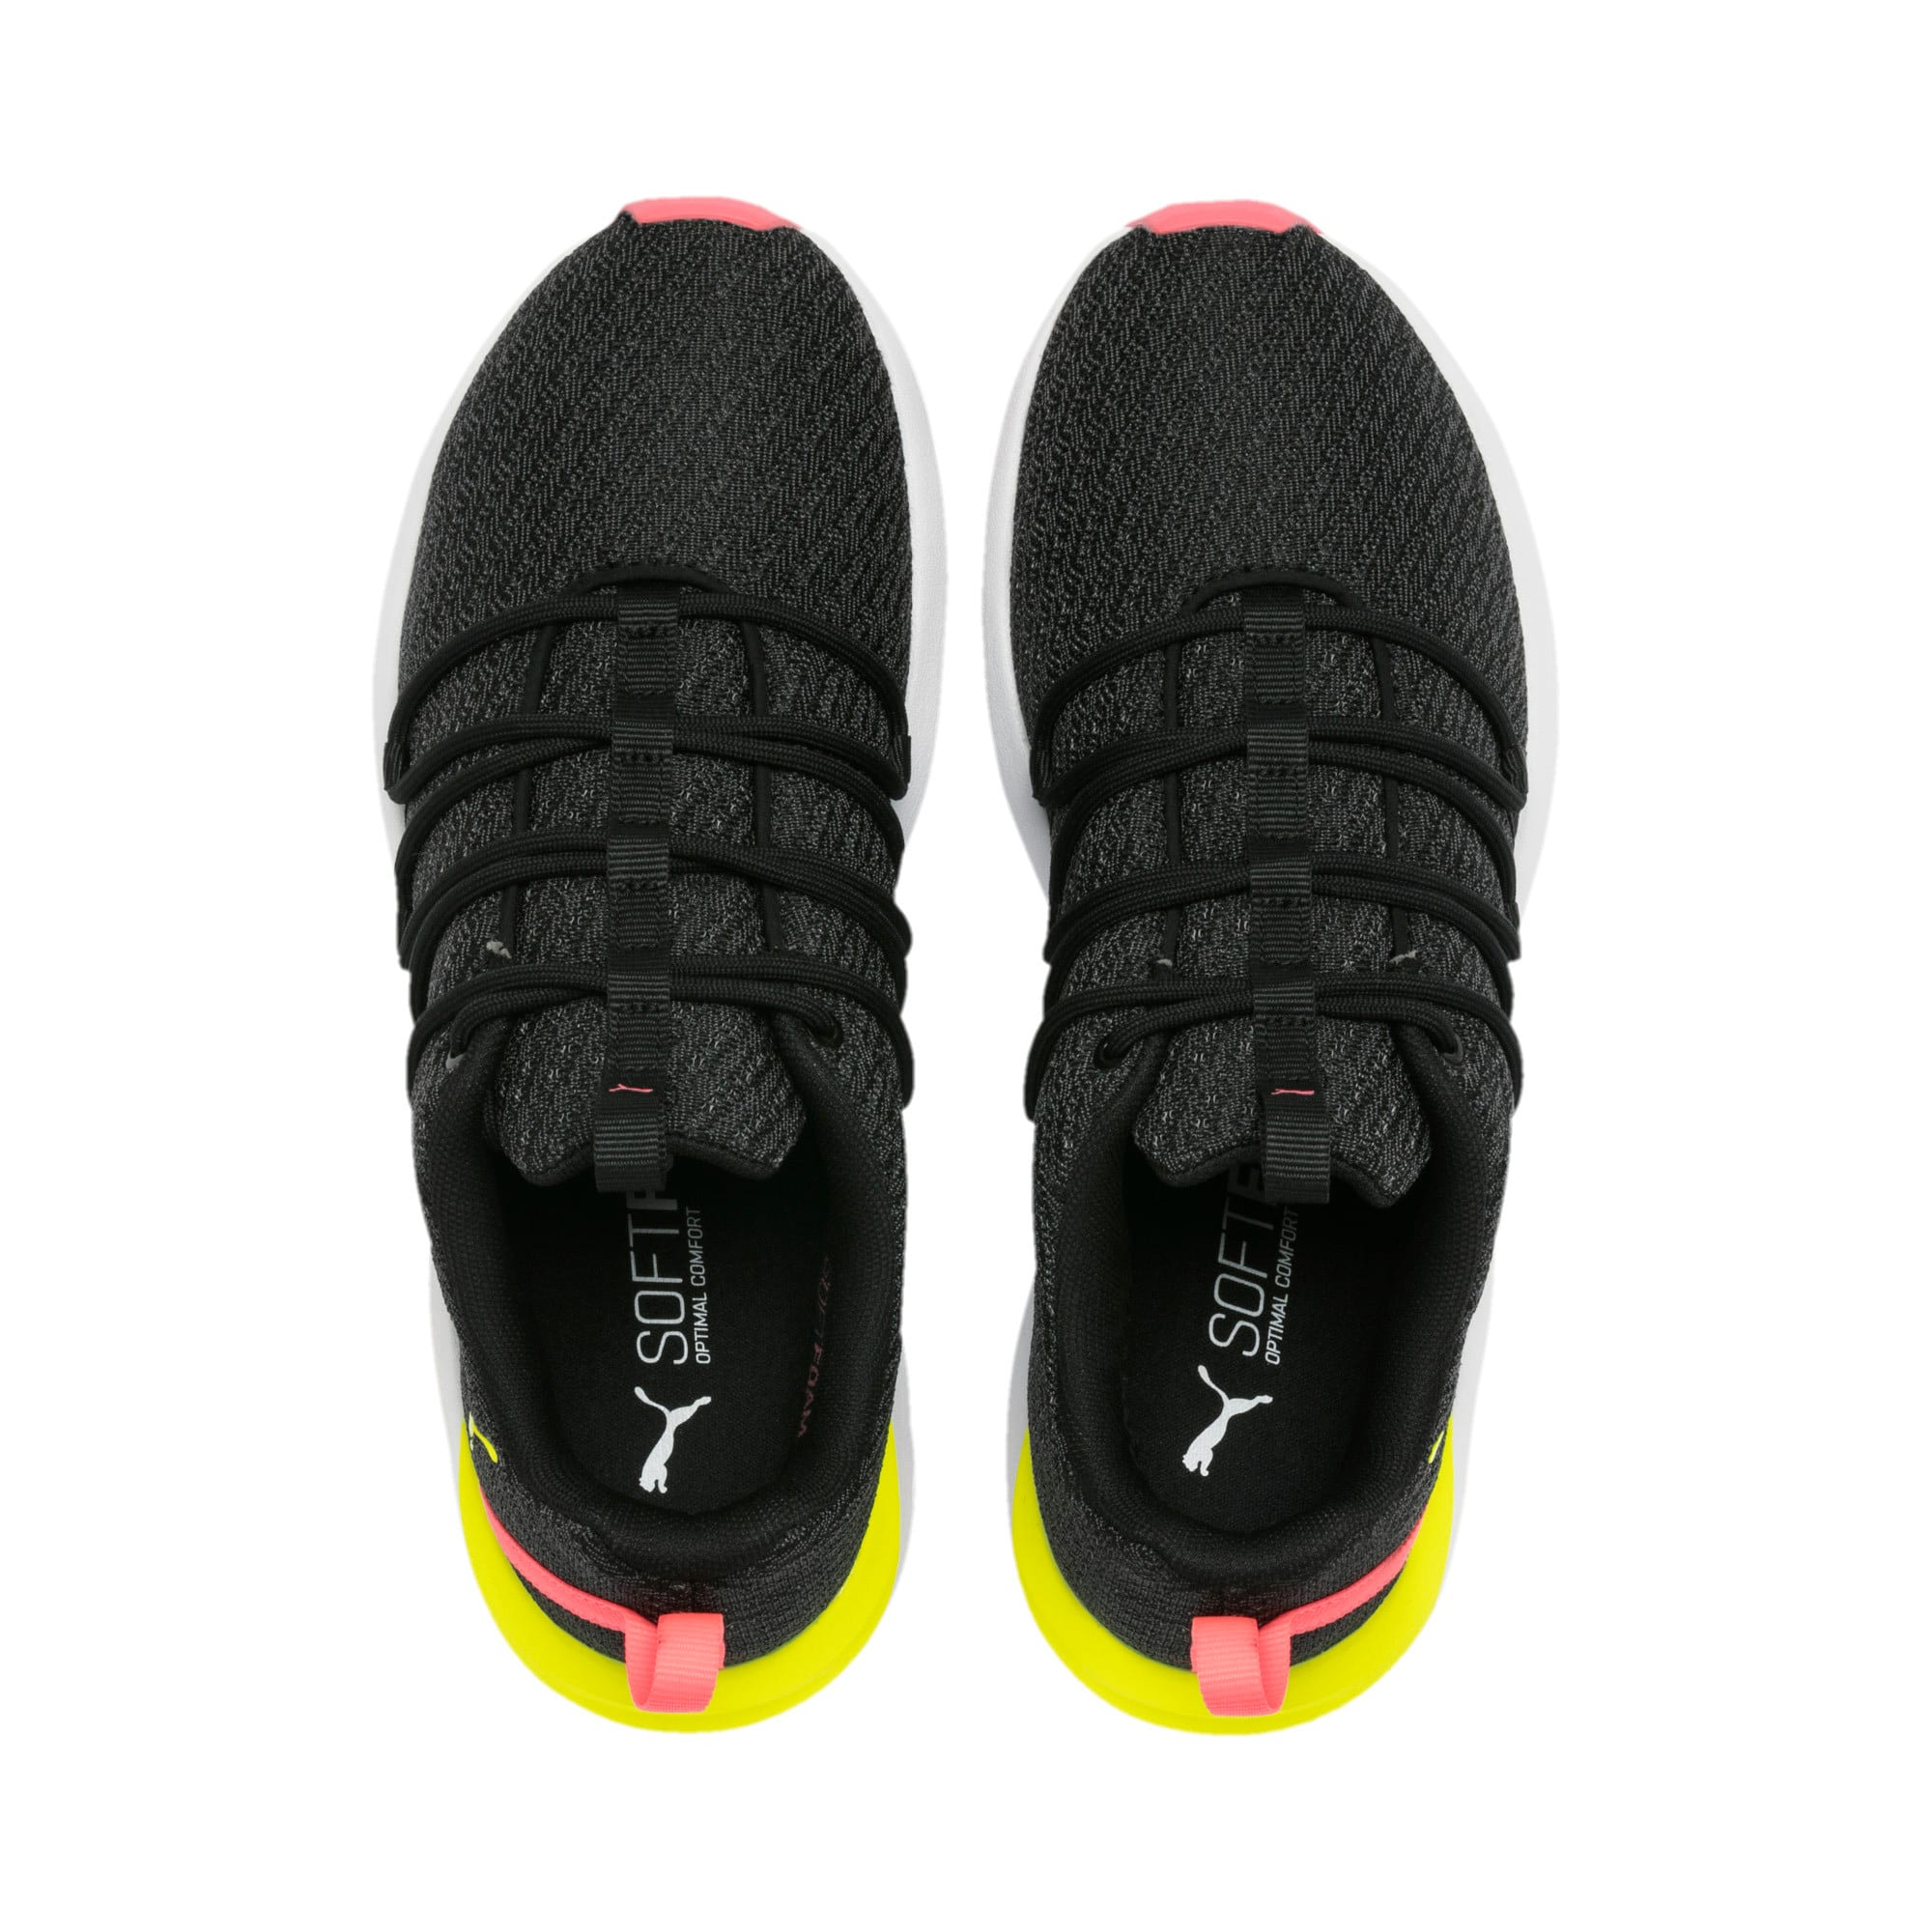 Imagen en miniatura 7 de Zapatillas de mujer Prowl Alt Neon, Puma Black-Yellow Alert, mediana